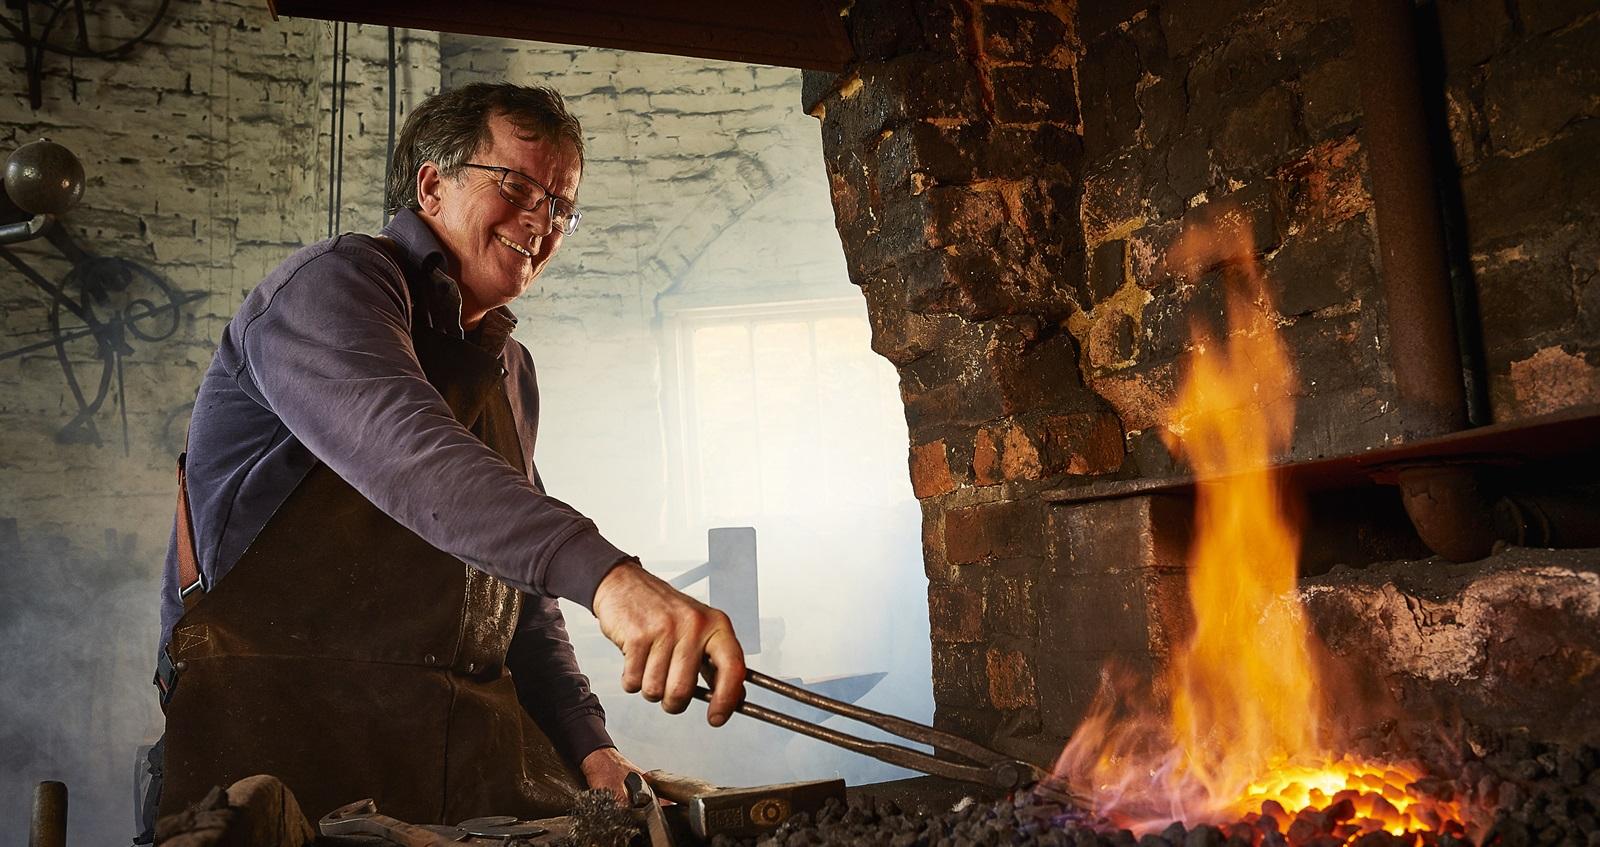 Veteran Tim Mackereth working as a blacksmith